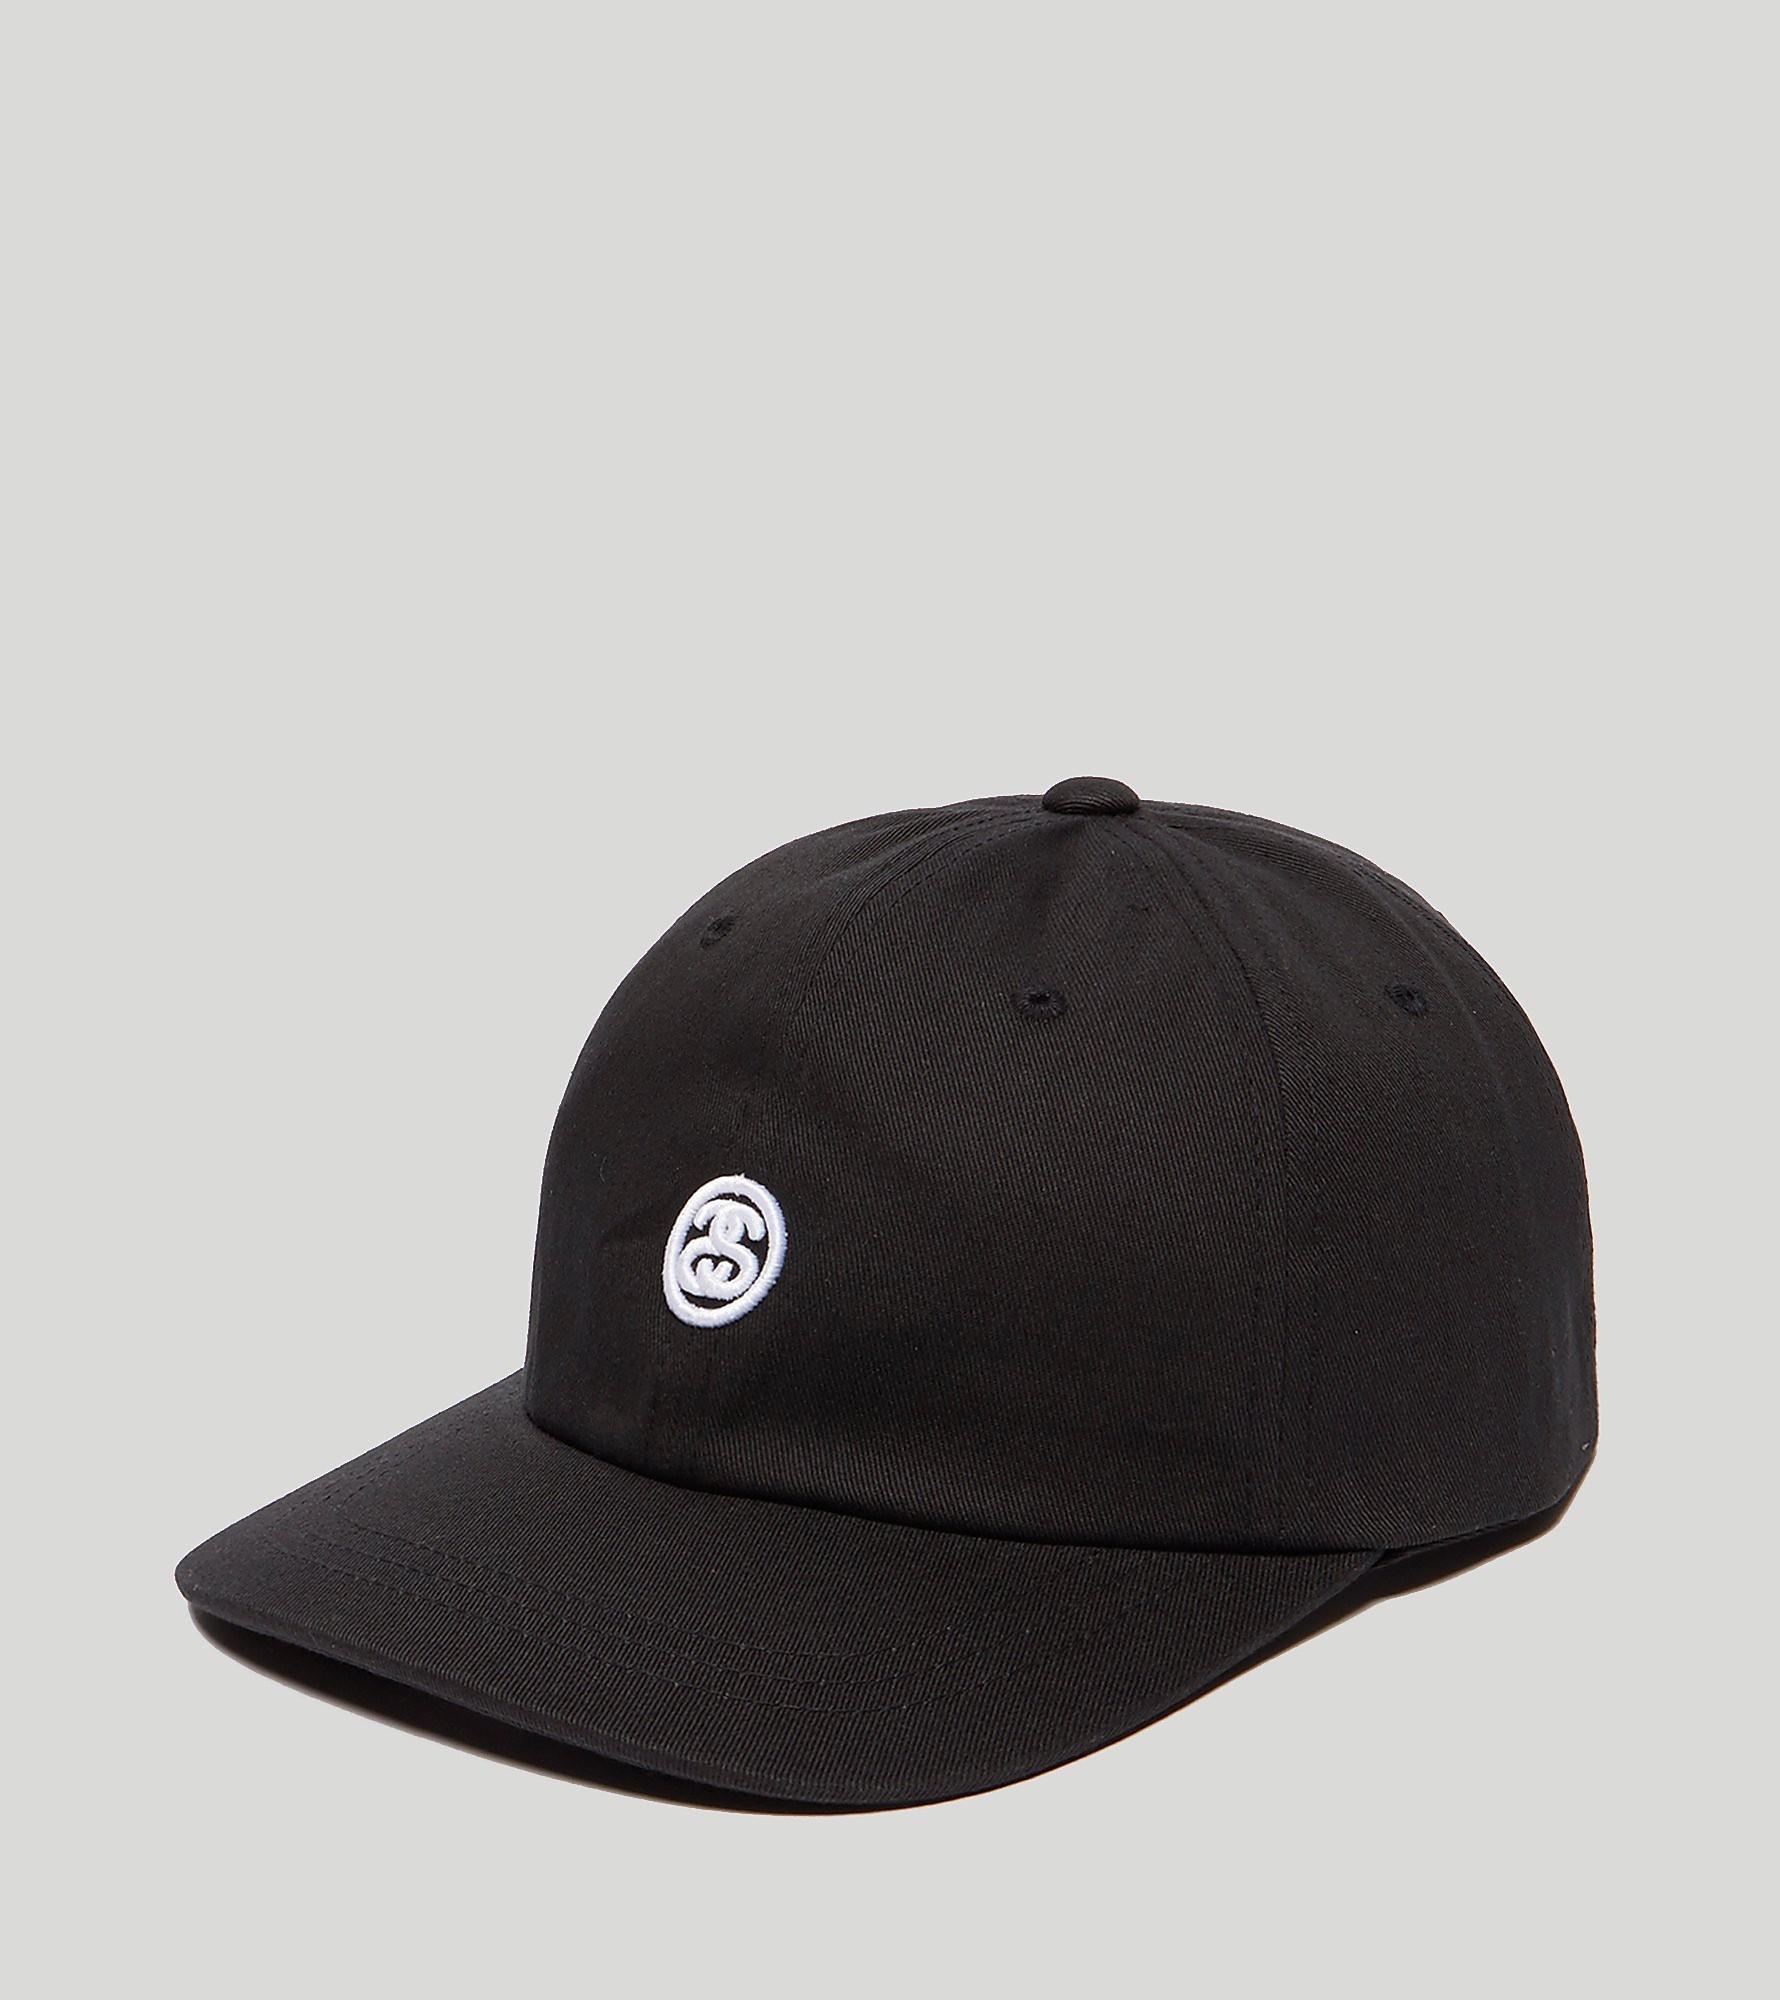 Stussy Contrast Strapback Cap